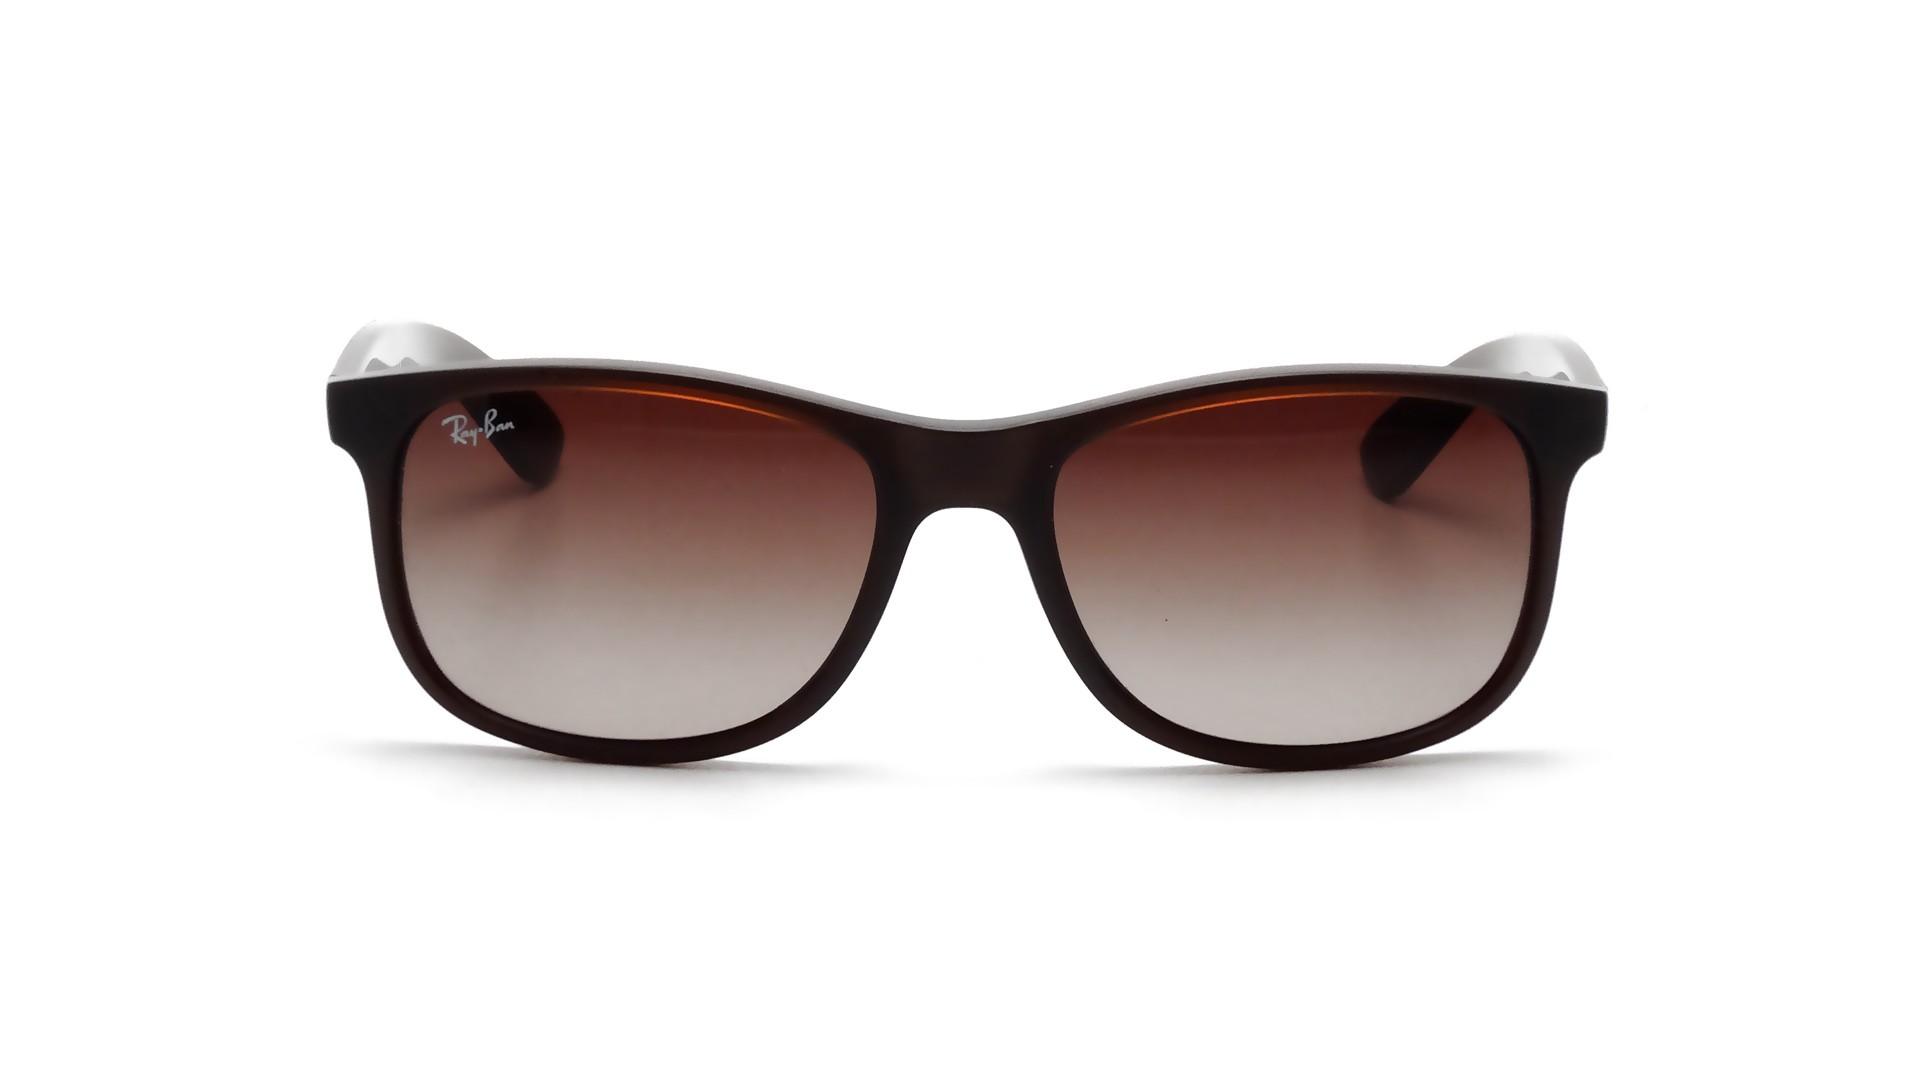 649462b046 Sunglasses Ray-Ban Andy Brown Matte RB4202 6073 13 55-17 Medium Gradient